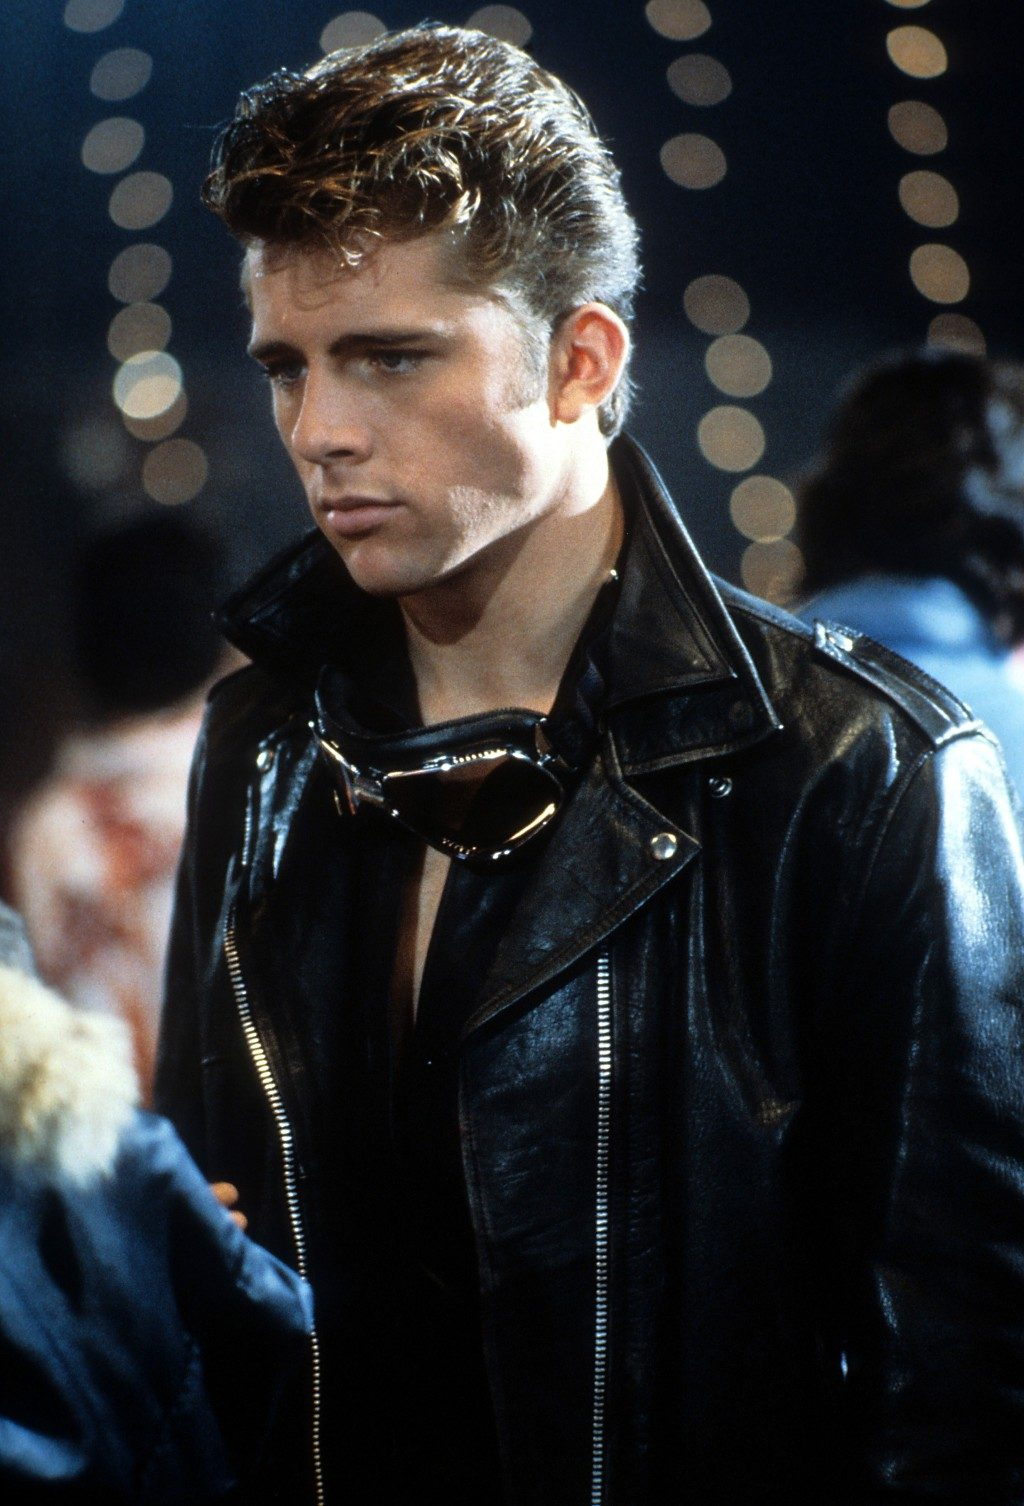 Maxwell Caulfield as Michael Carrington in Grease 2